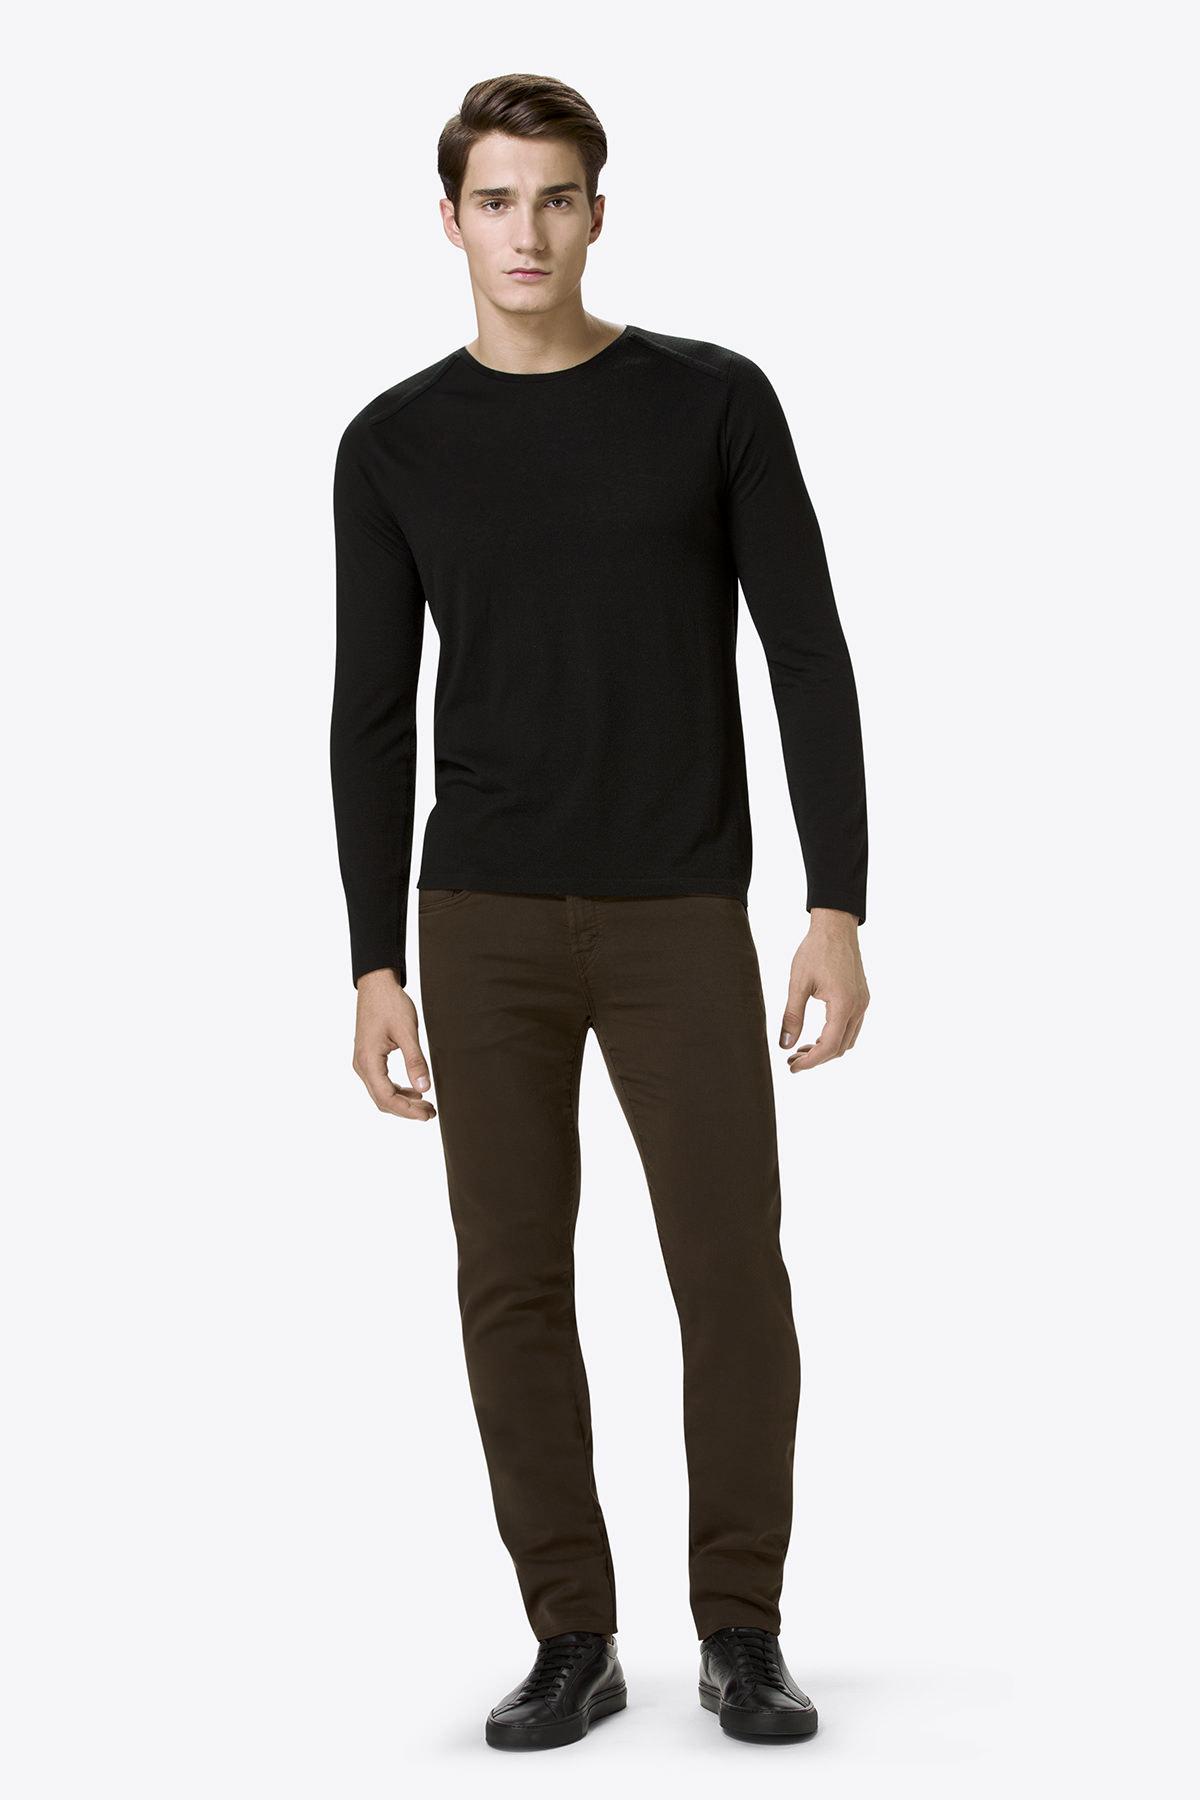 jbrand, french terry, jeans, denim, pants